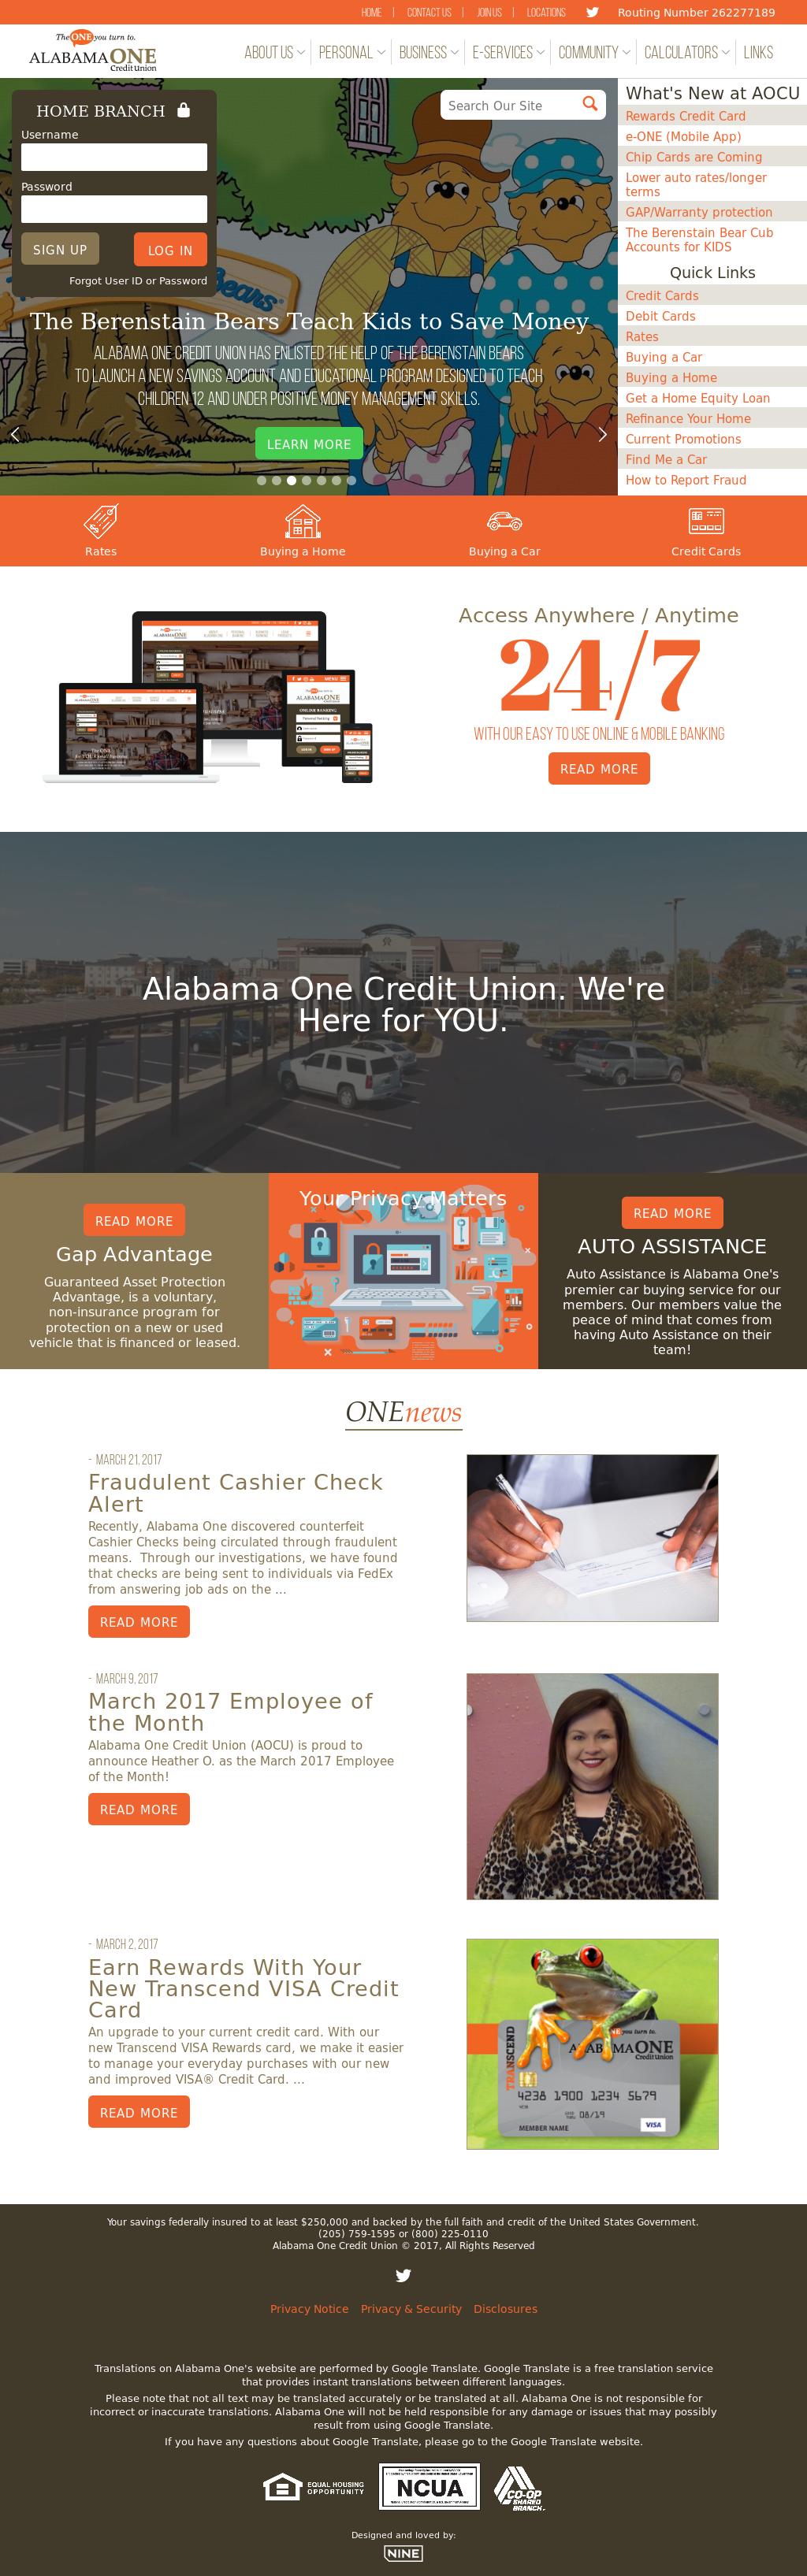 Alabama one credit union phone number